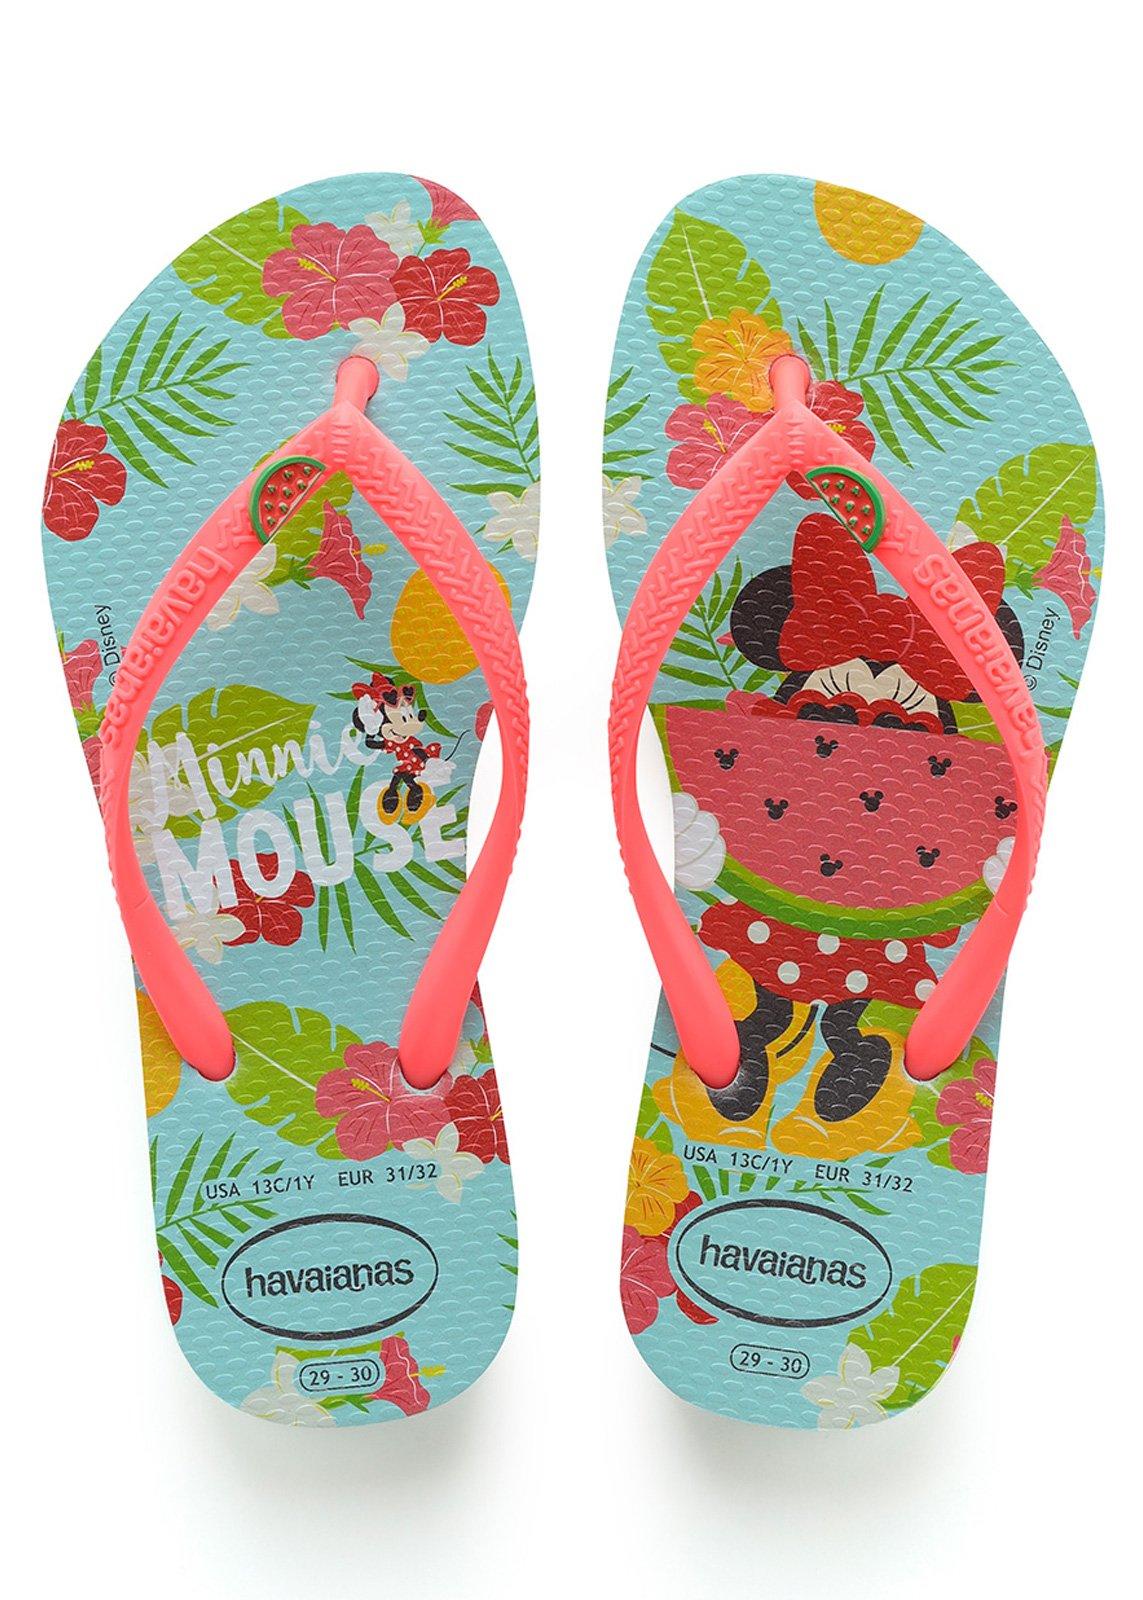 b426e4c0f4f24 Flip-Flops Kids Disney Cool Ice Blue-coralnew - Brand Havaianas